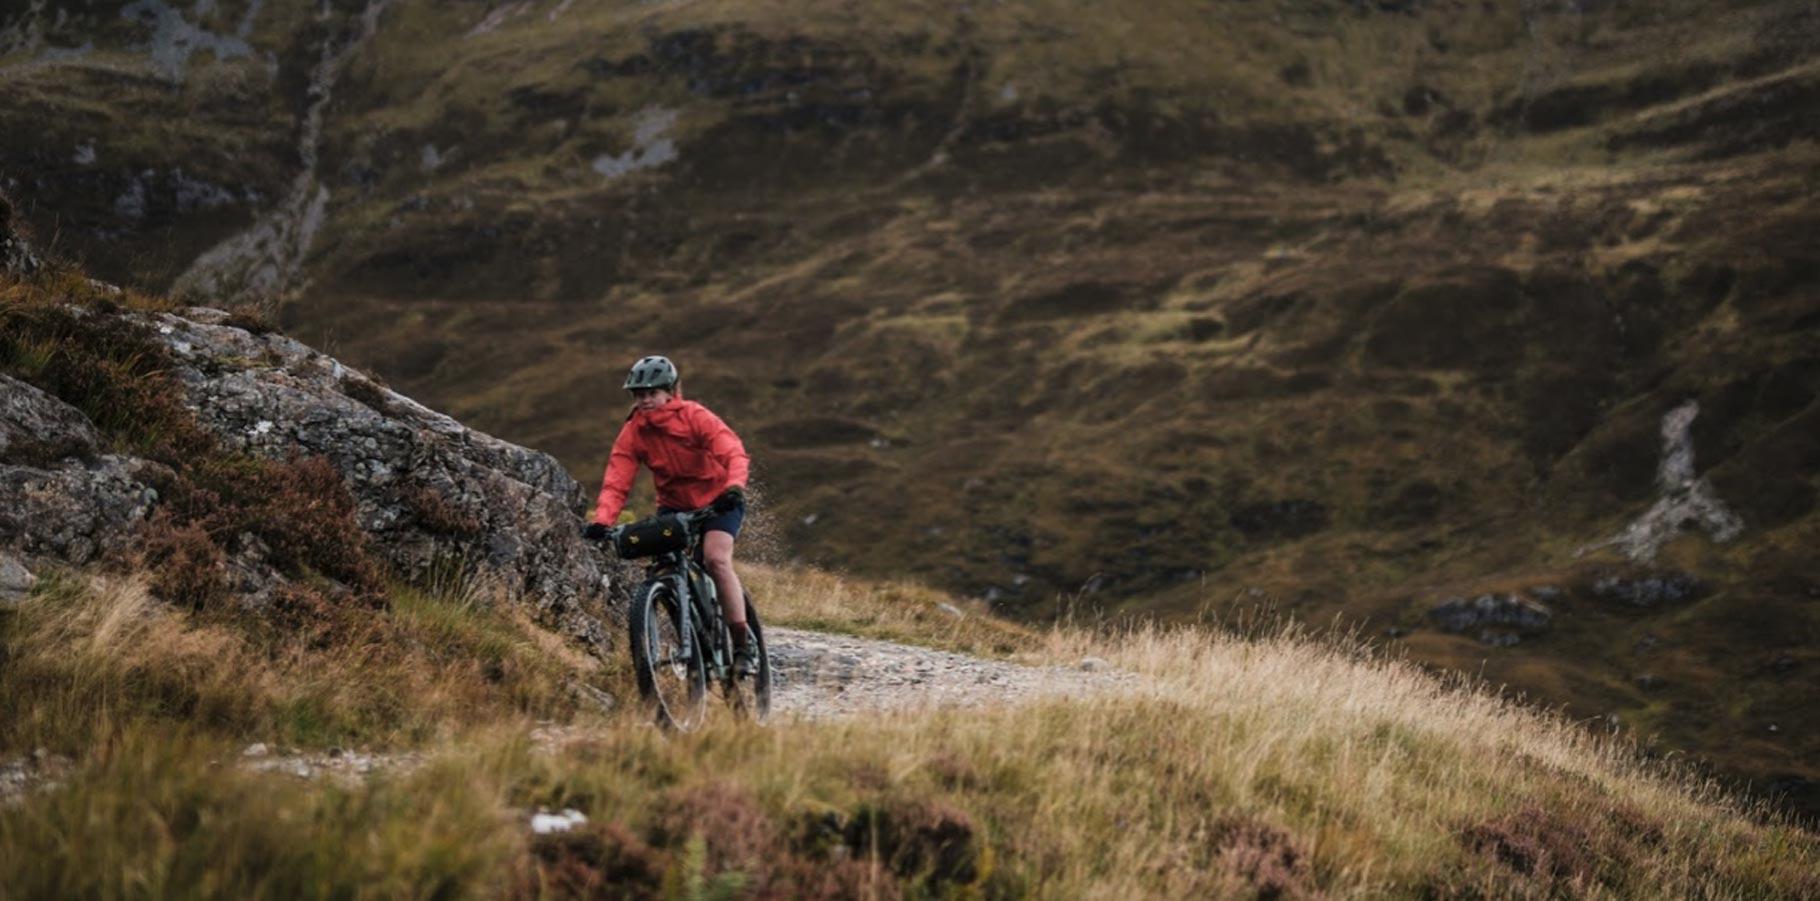 Apidura-brasny-bikepacking-new-backcountry